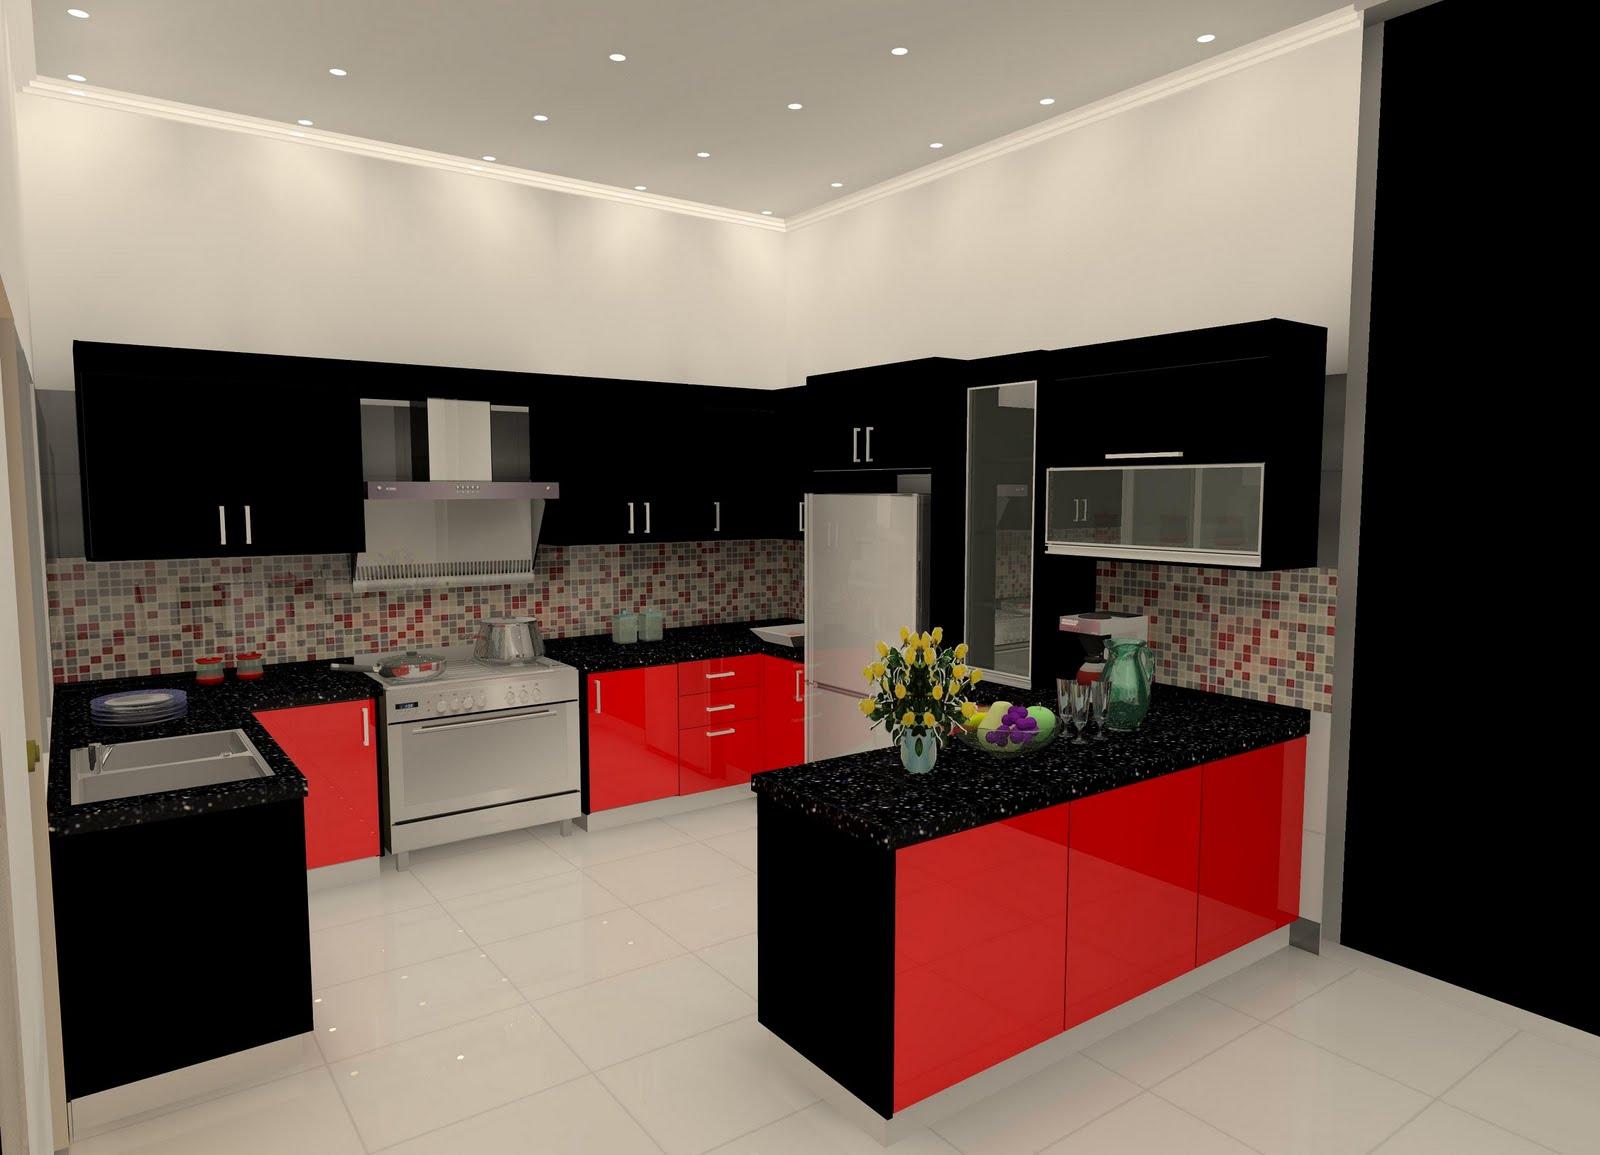 Emm Dok Google Ternampak Interior Design Untuk Dapur Cantiknya Sebab Aku Nak Buat Yg Temanya Macam Dalam Gambar Tu Huhuuuu Merah Hitam